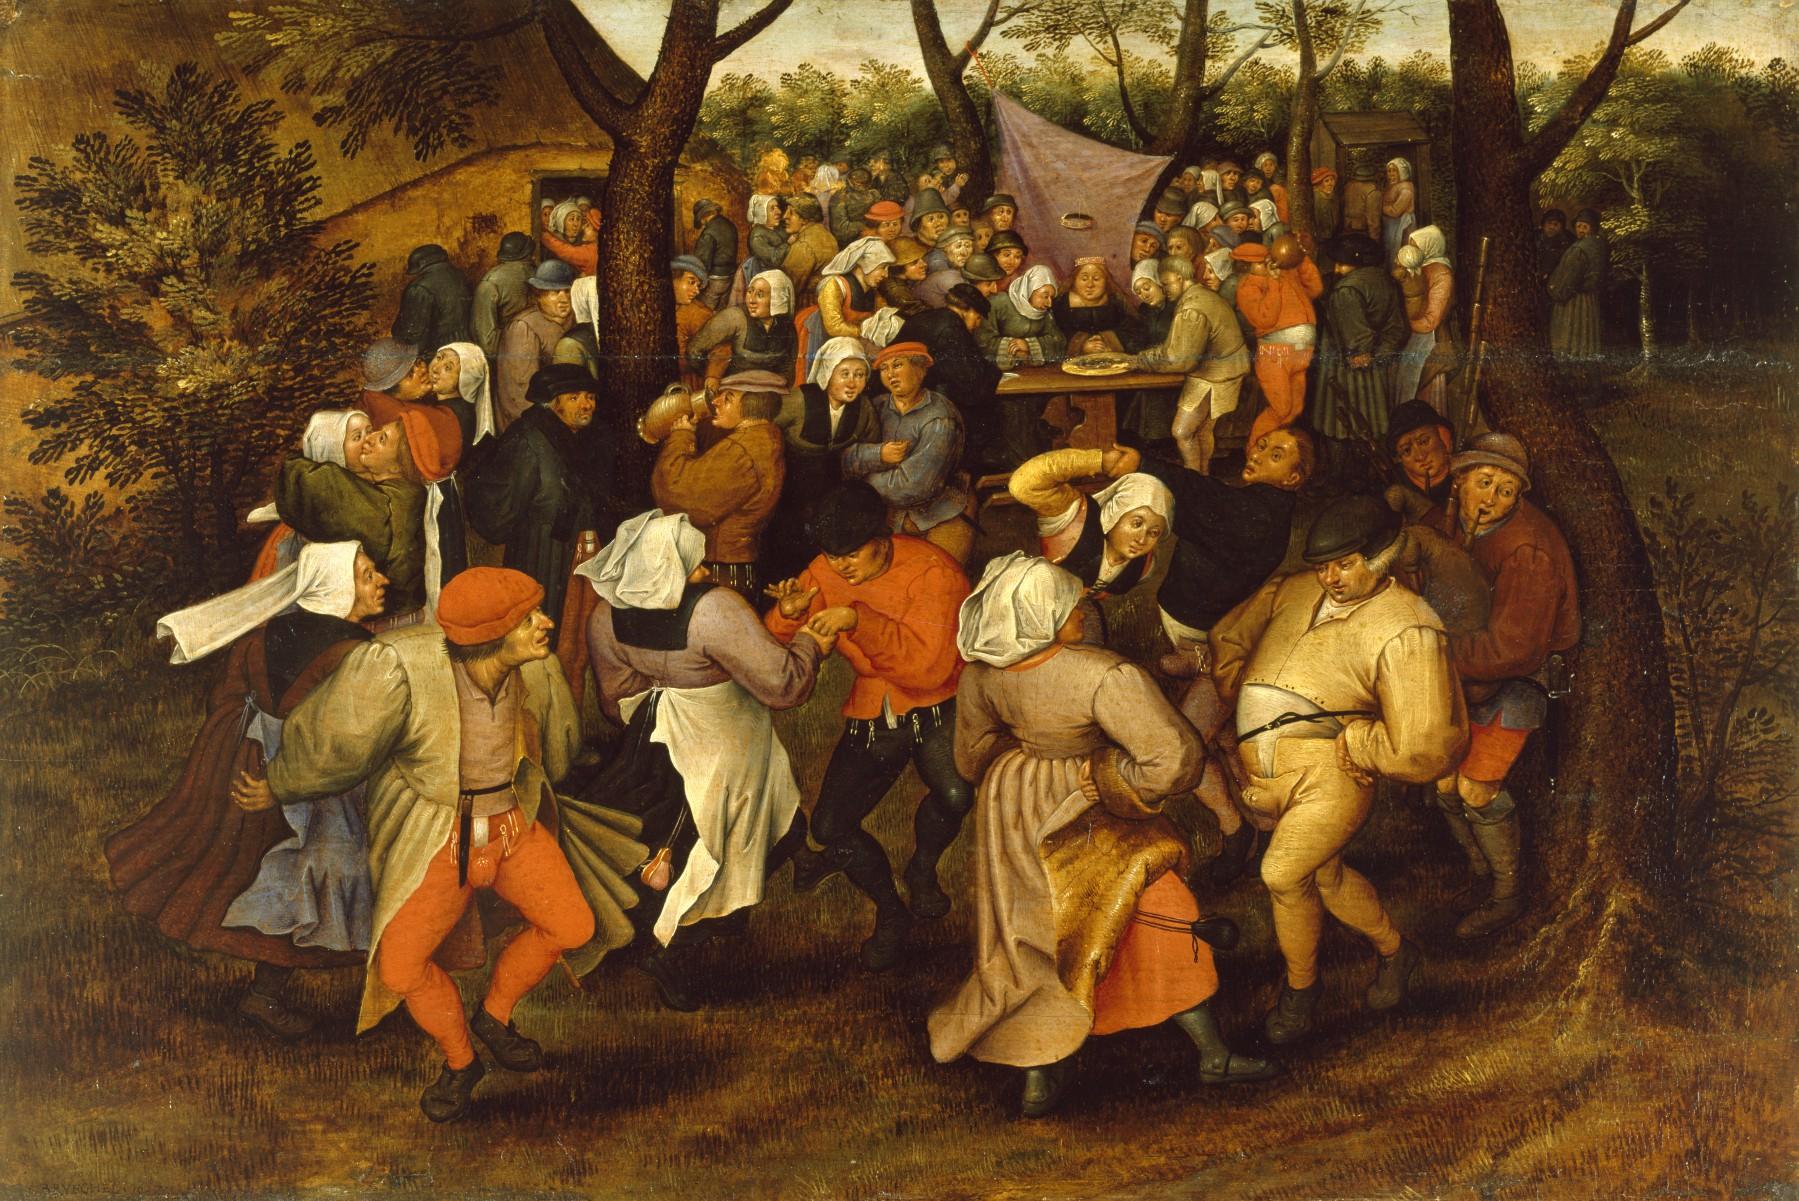 Peasant Wedding Dance, by Pieter Brueghel II, 1607. The Walters Art Museum.